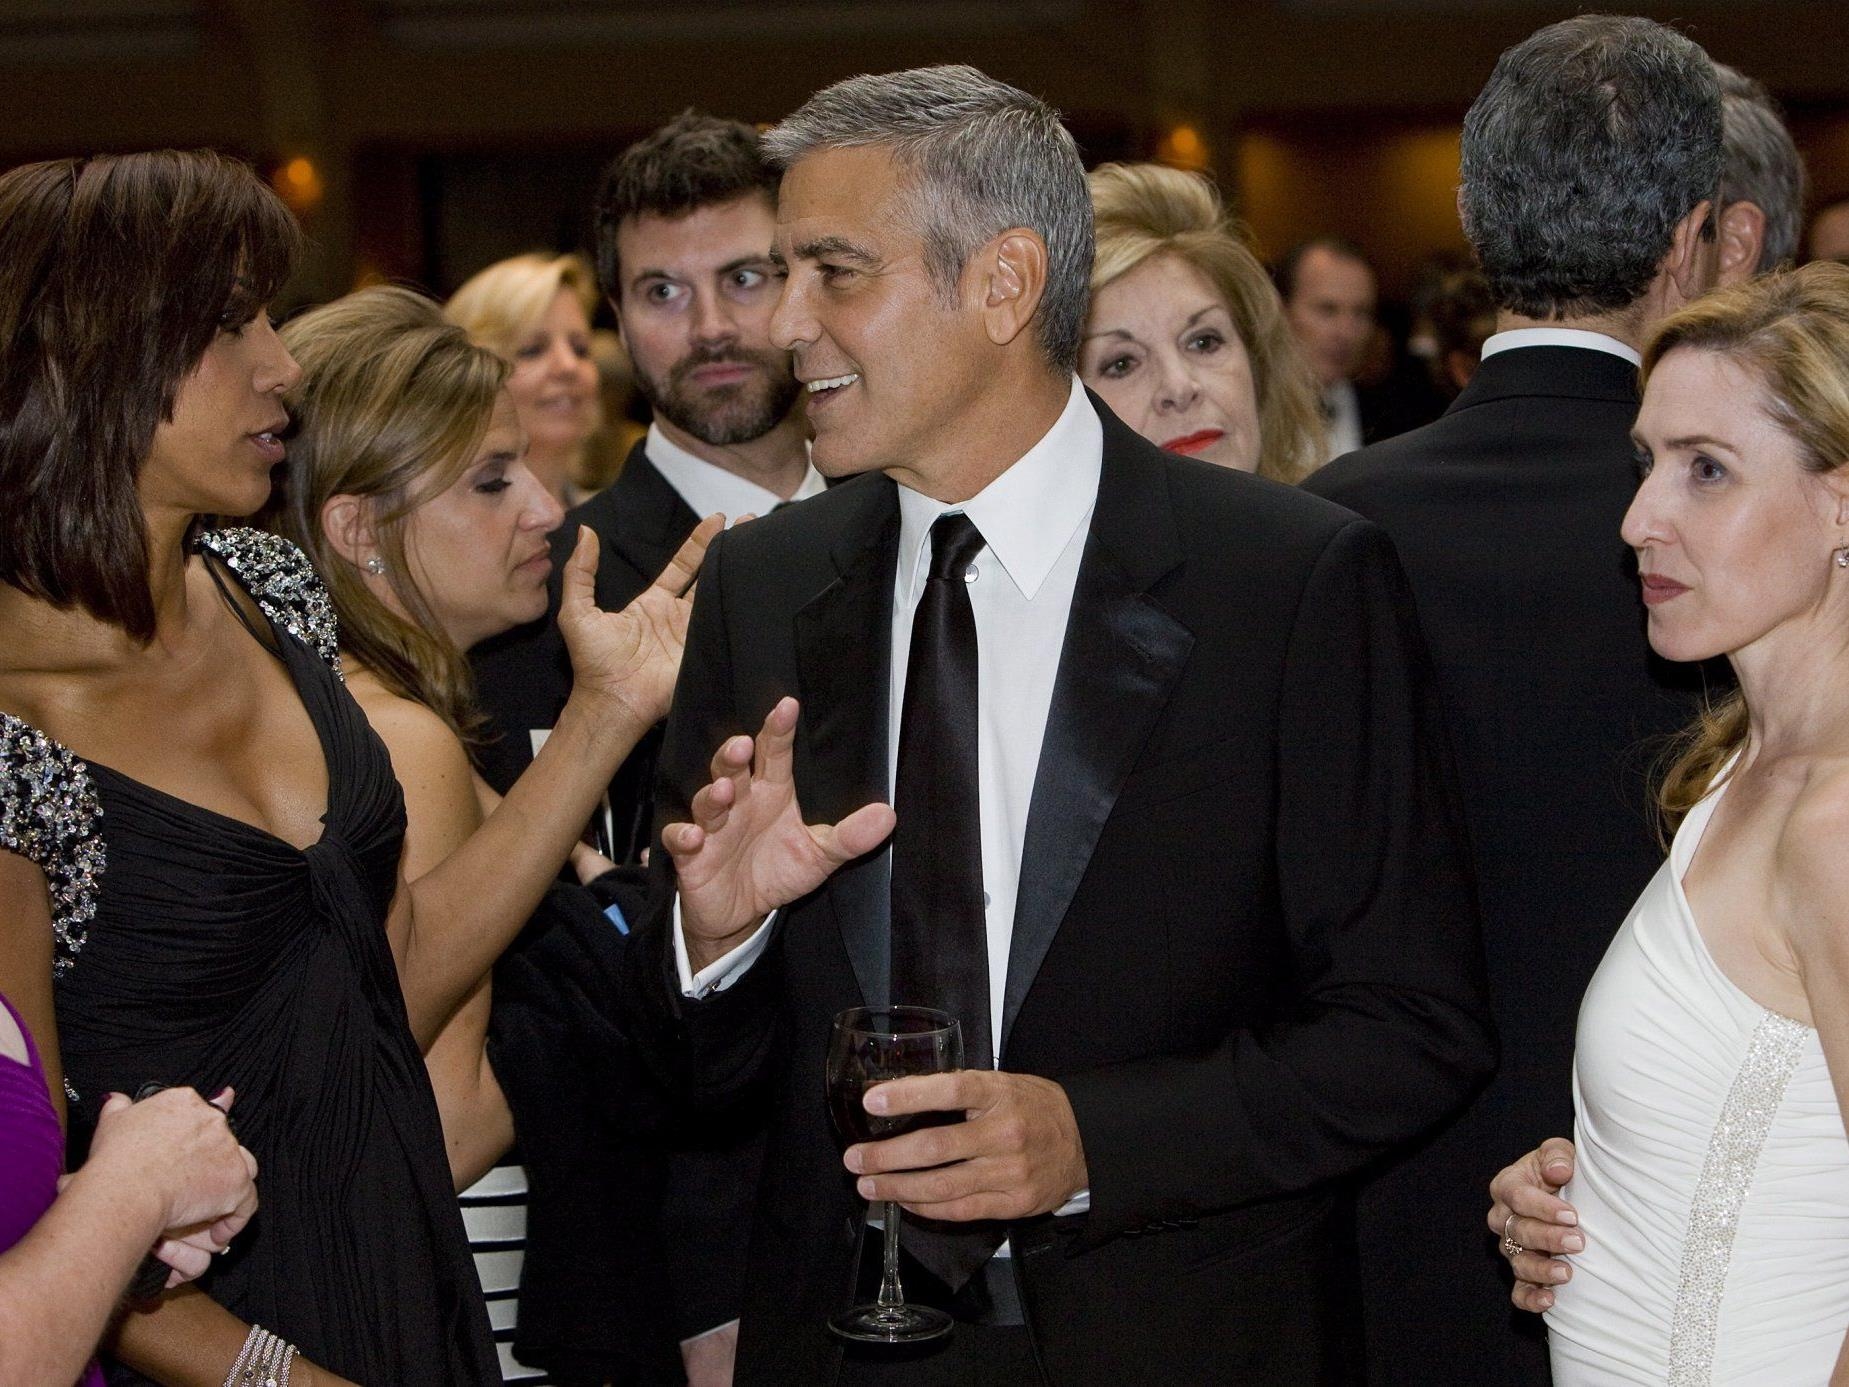 George Clooney genoss das Bad in der Menge